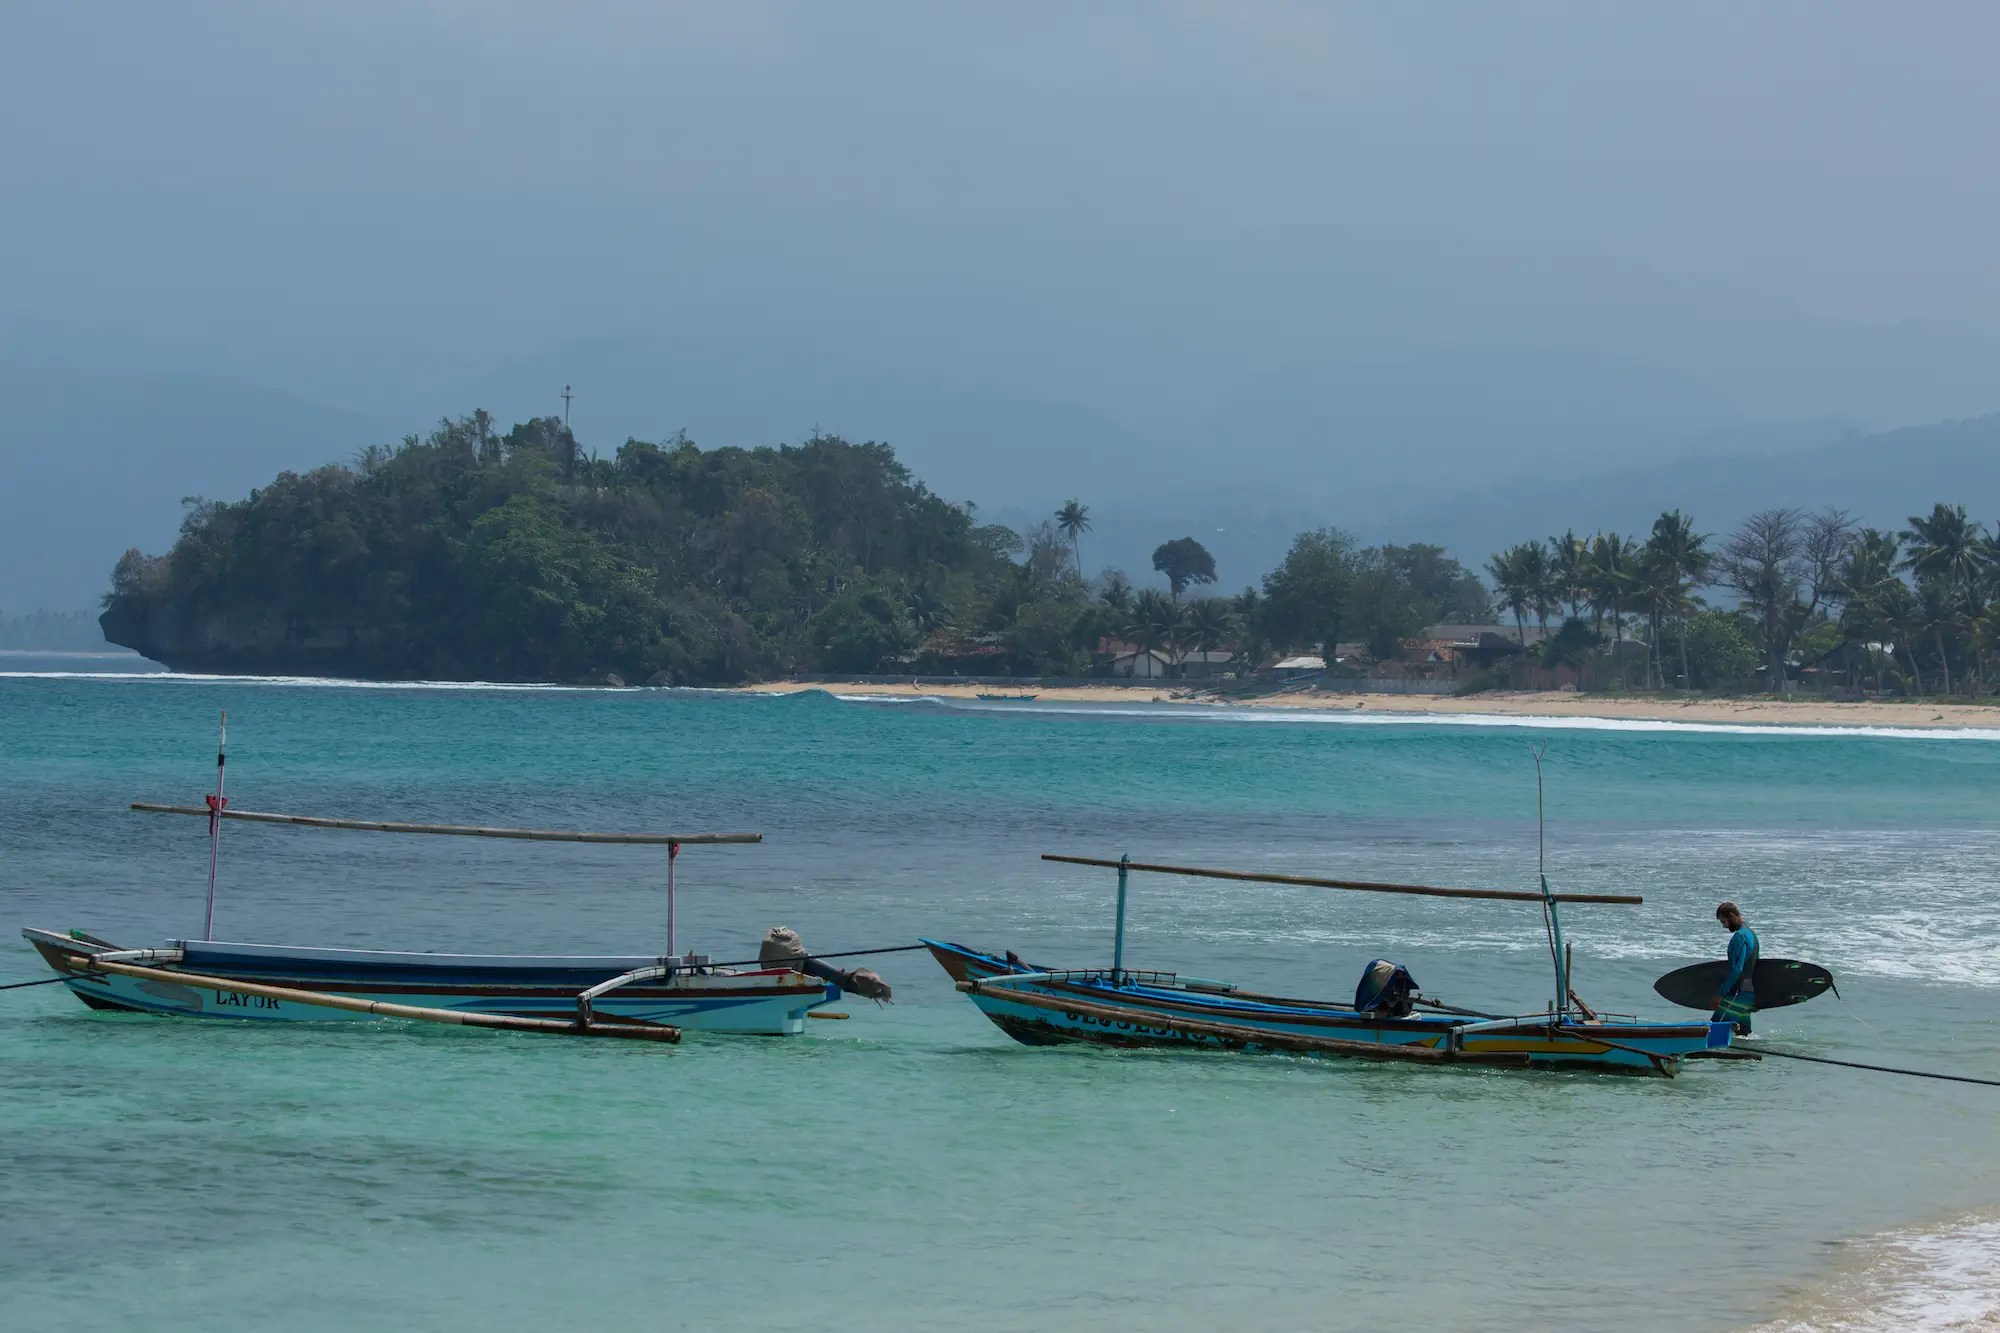 Krui, Sumatra.